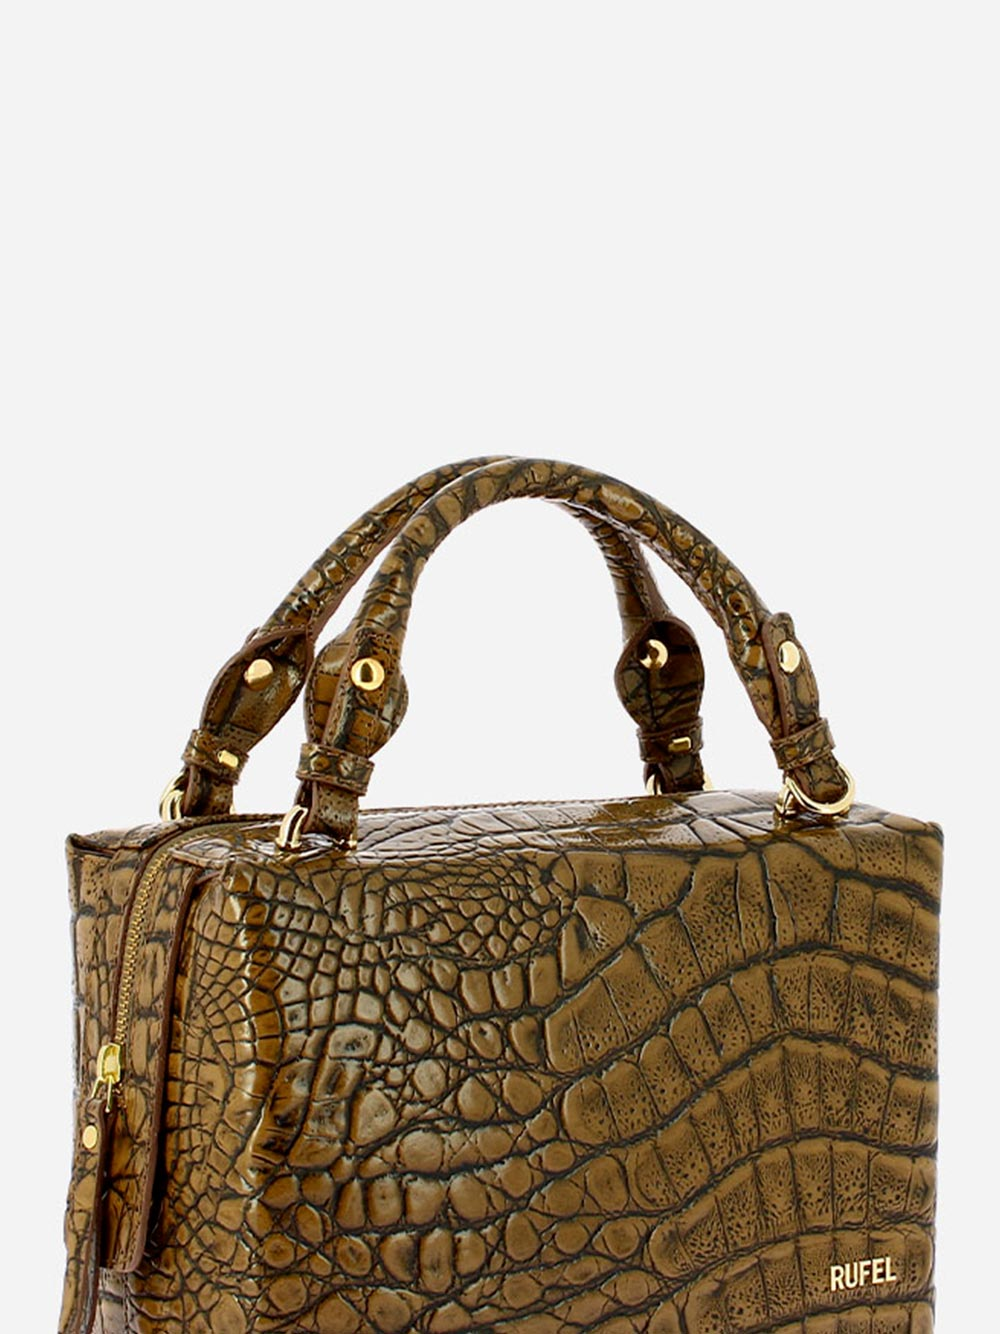 Croco Wild Taupe Handbag